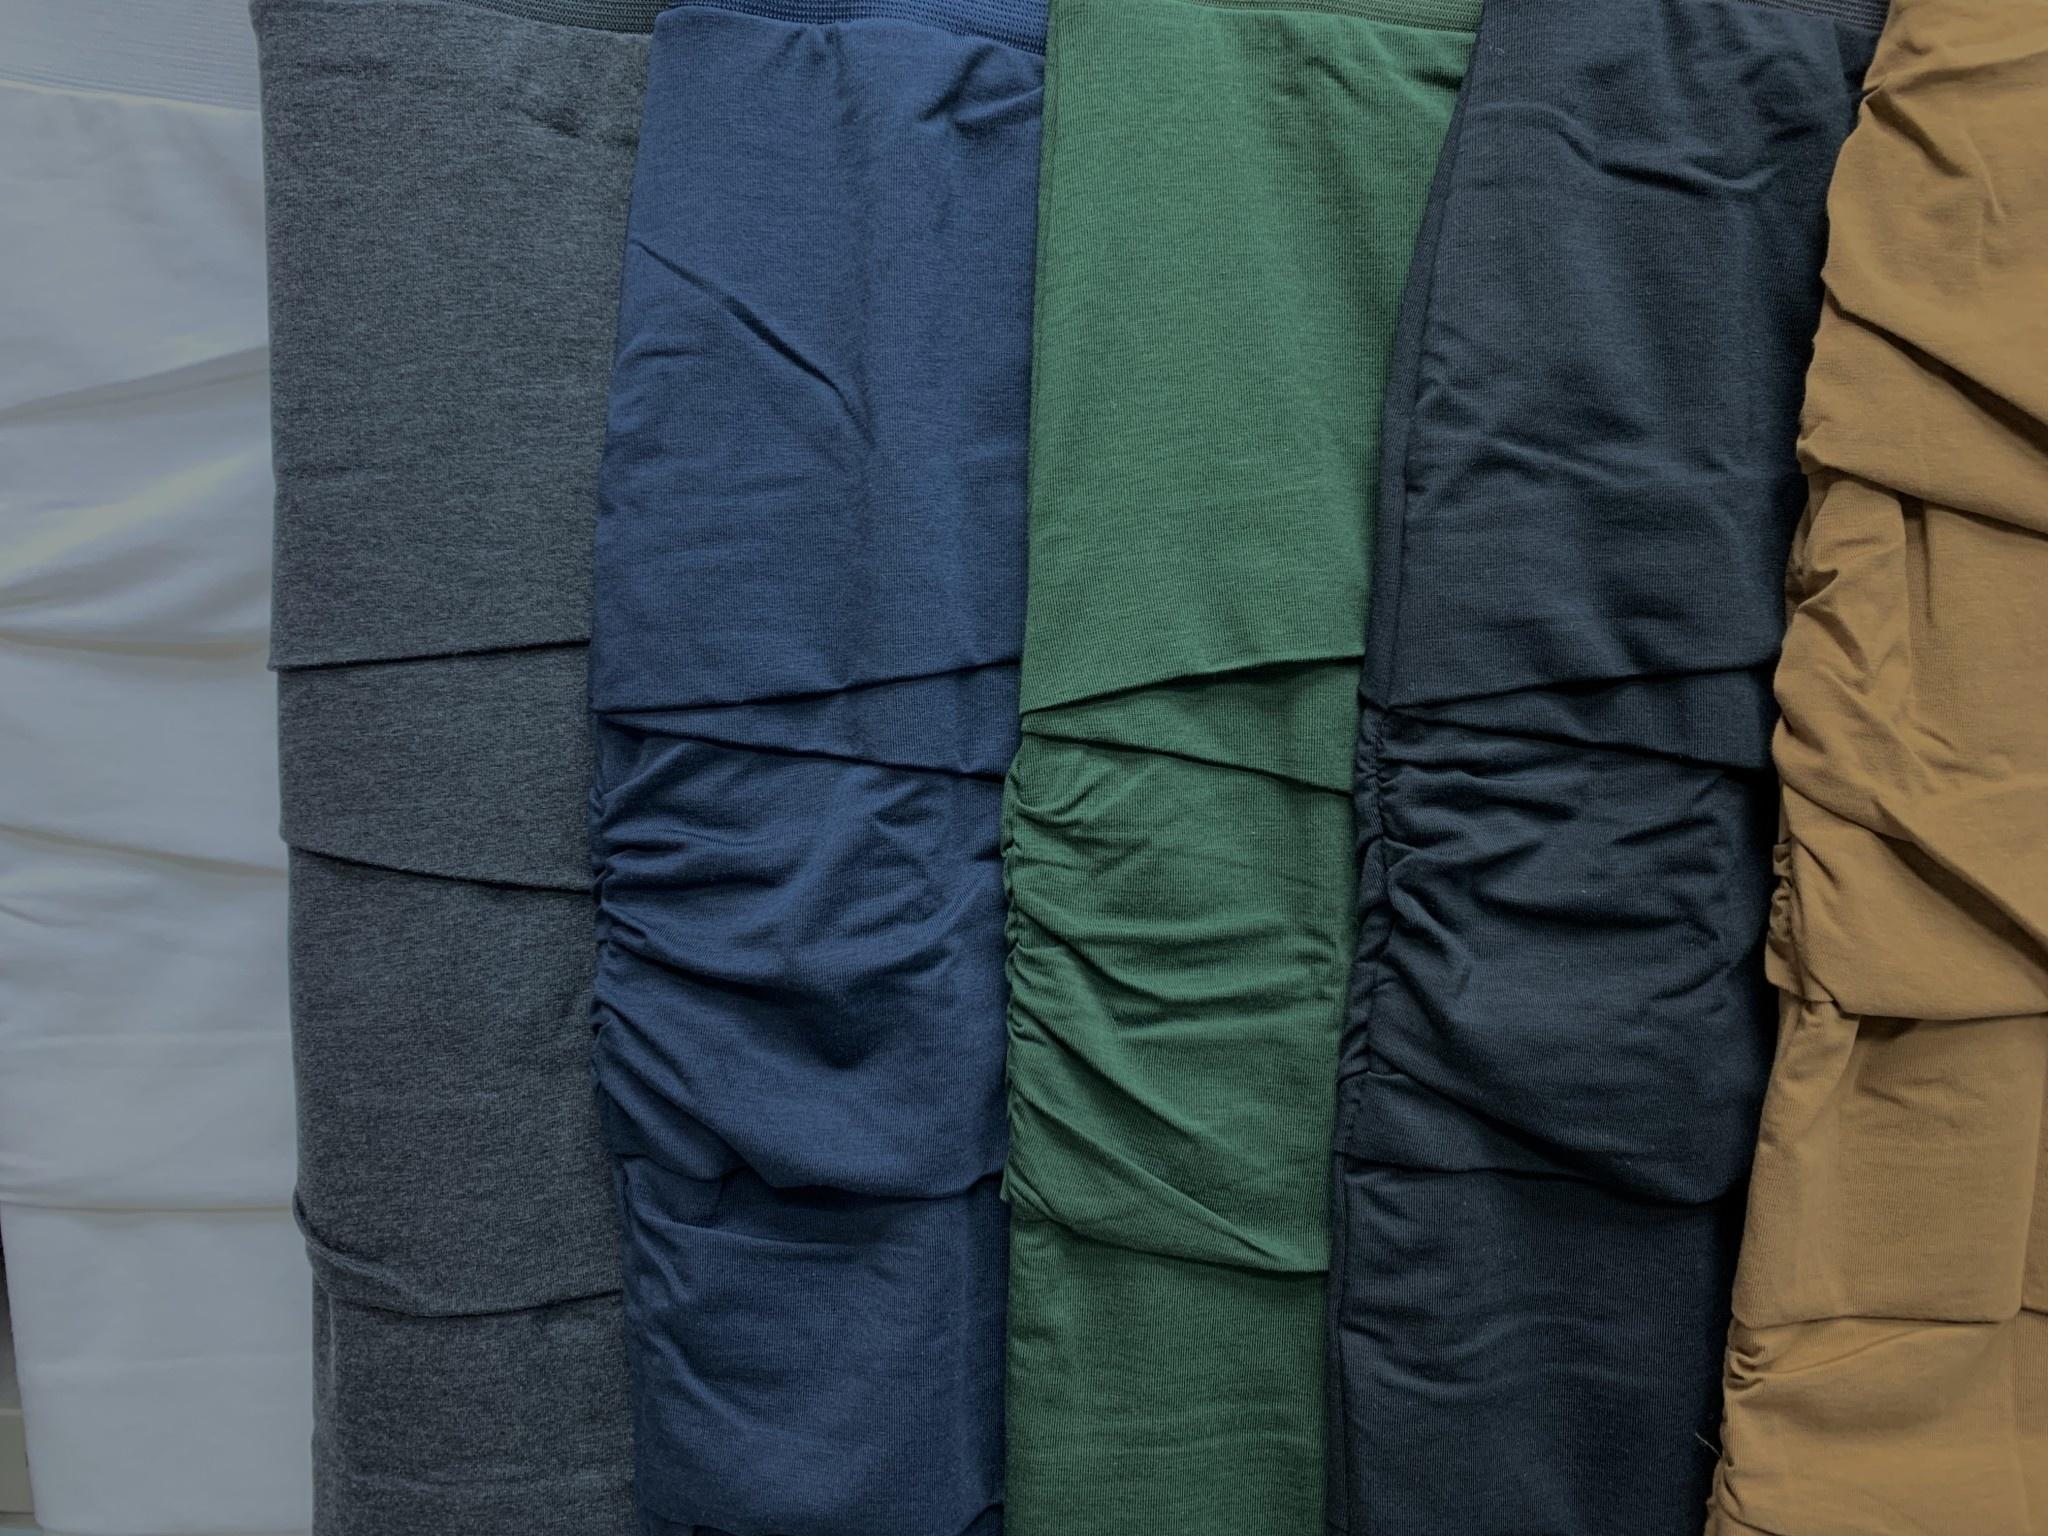 Jersey Layered Skirt - Longer Length